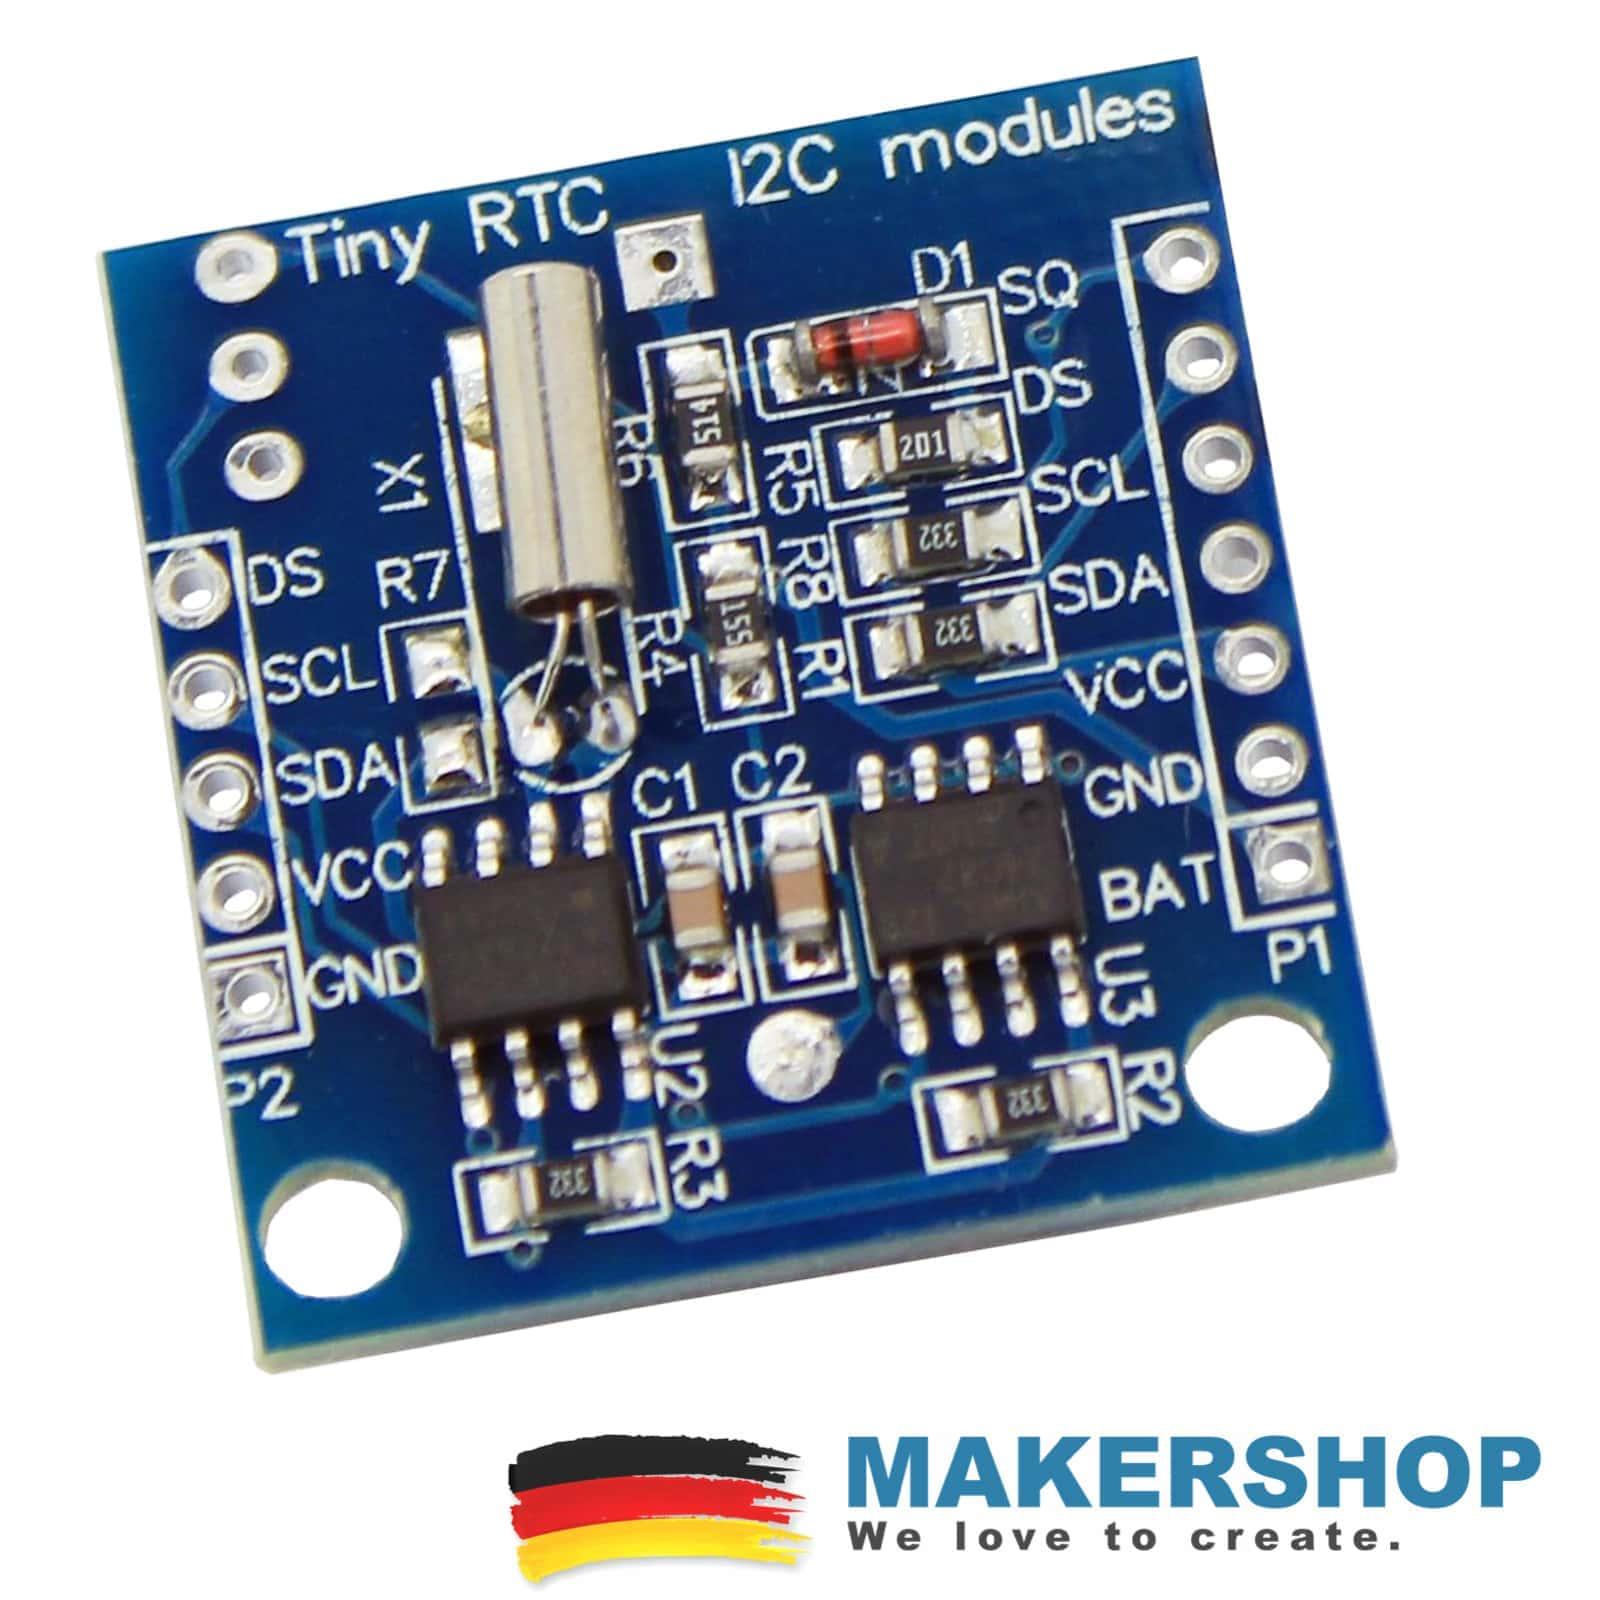 Rtc Ds1307 At24c32 Iic Real Time Clock Modul Temperatur Arduino Ds1307realtimeclockschematic Click To Enlarge Startseiteshopraspberry Pizubehr